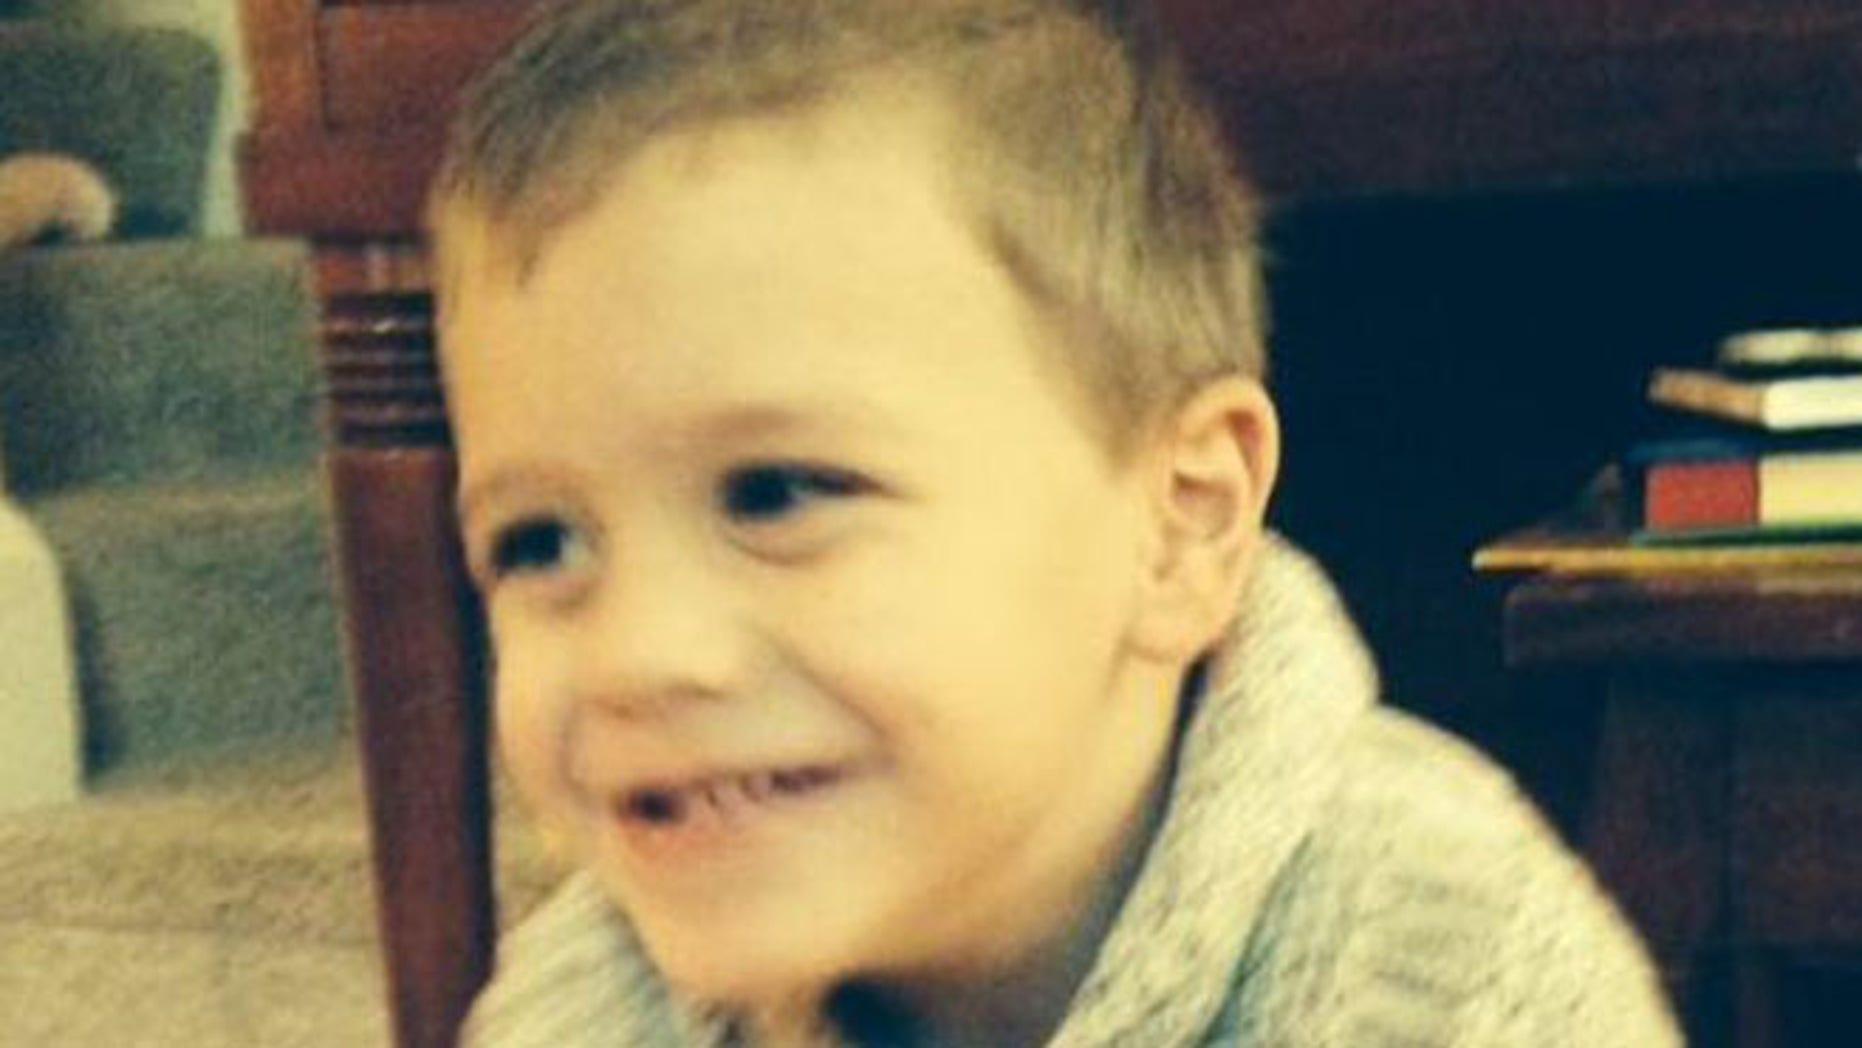 Sidney Heidrick, 4, was last reported seen Friday, July 24. (FBI)